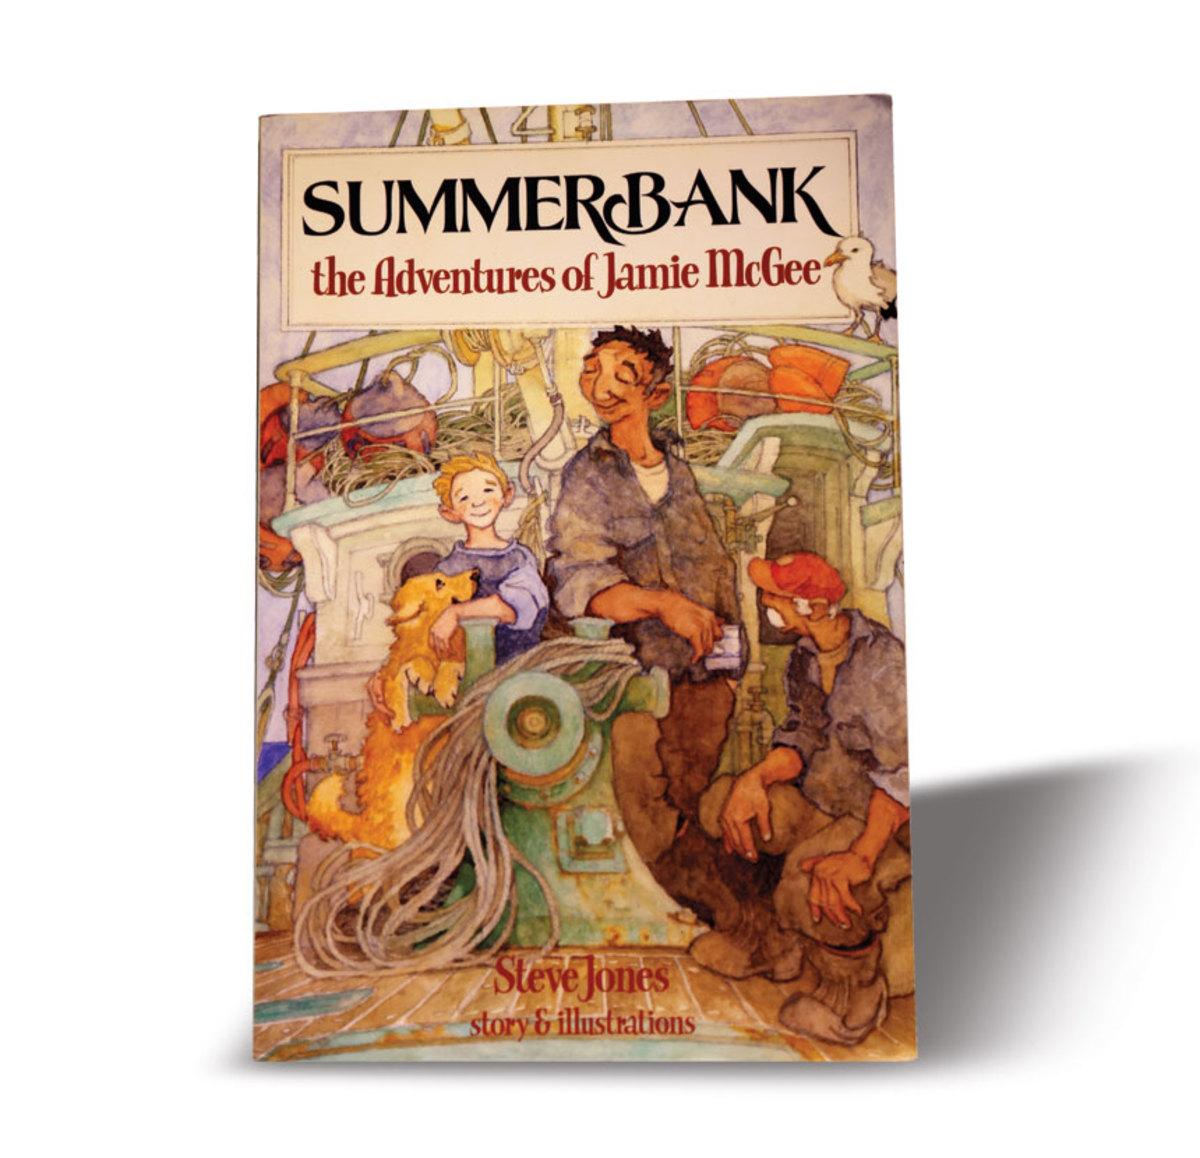 Summerbank